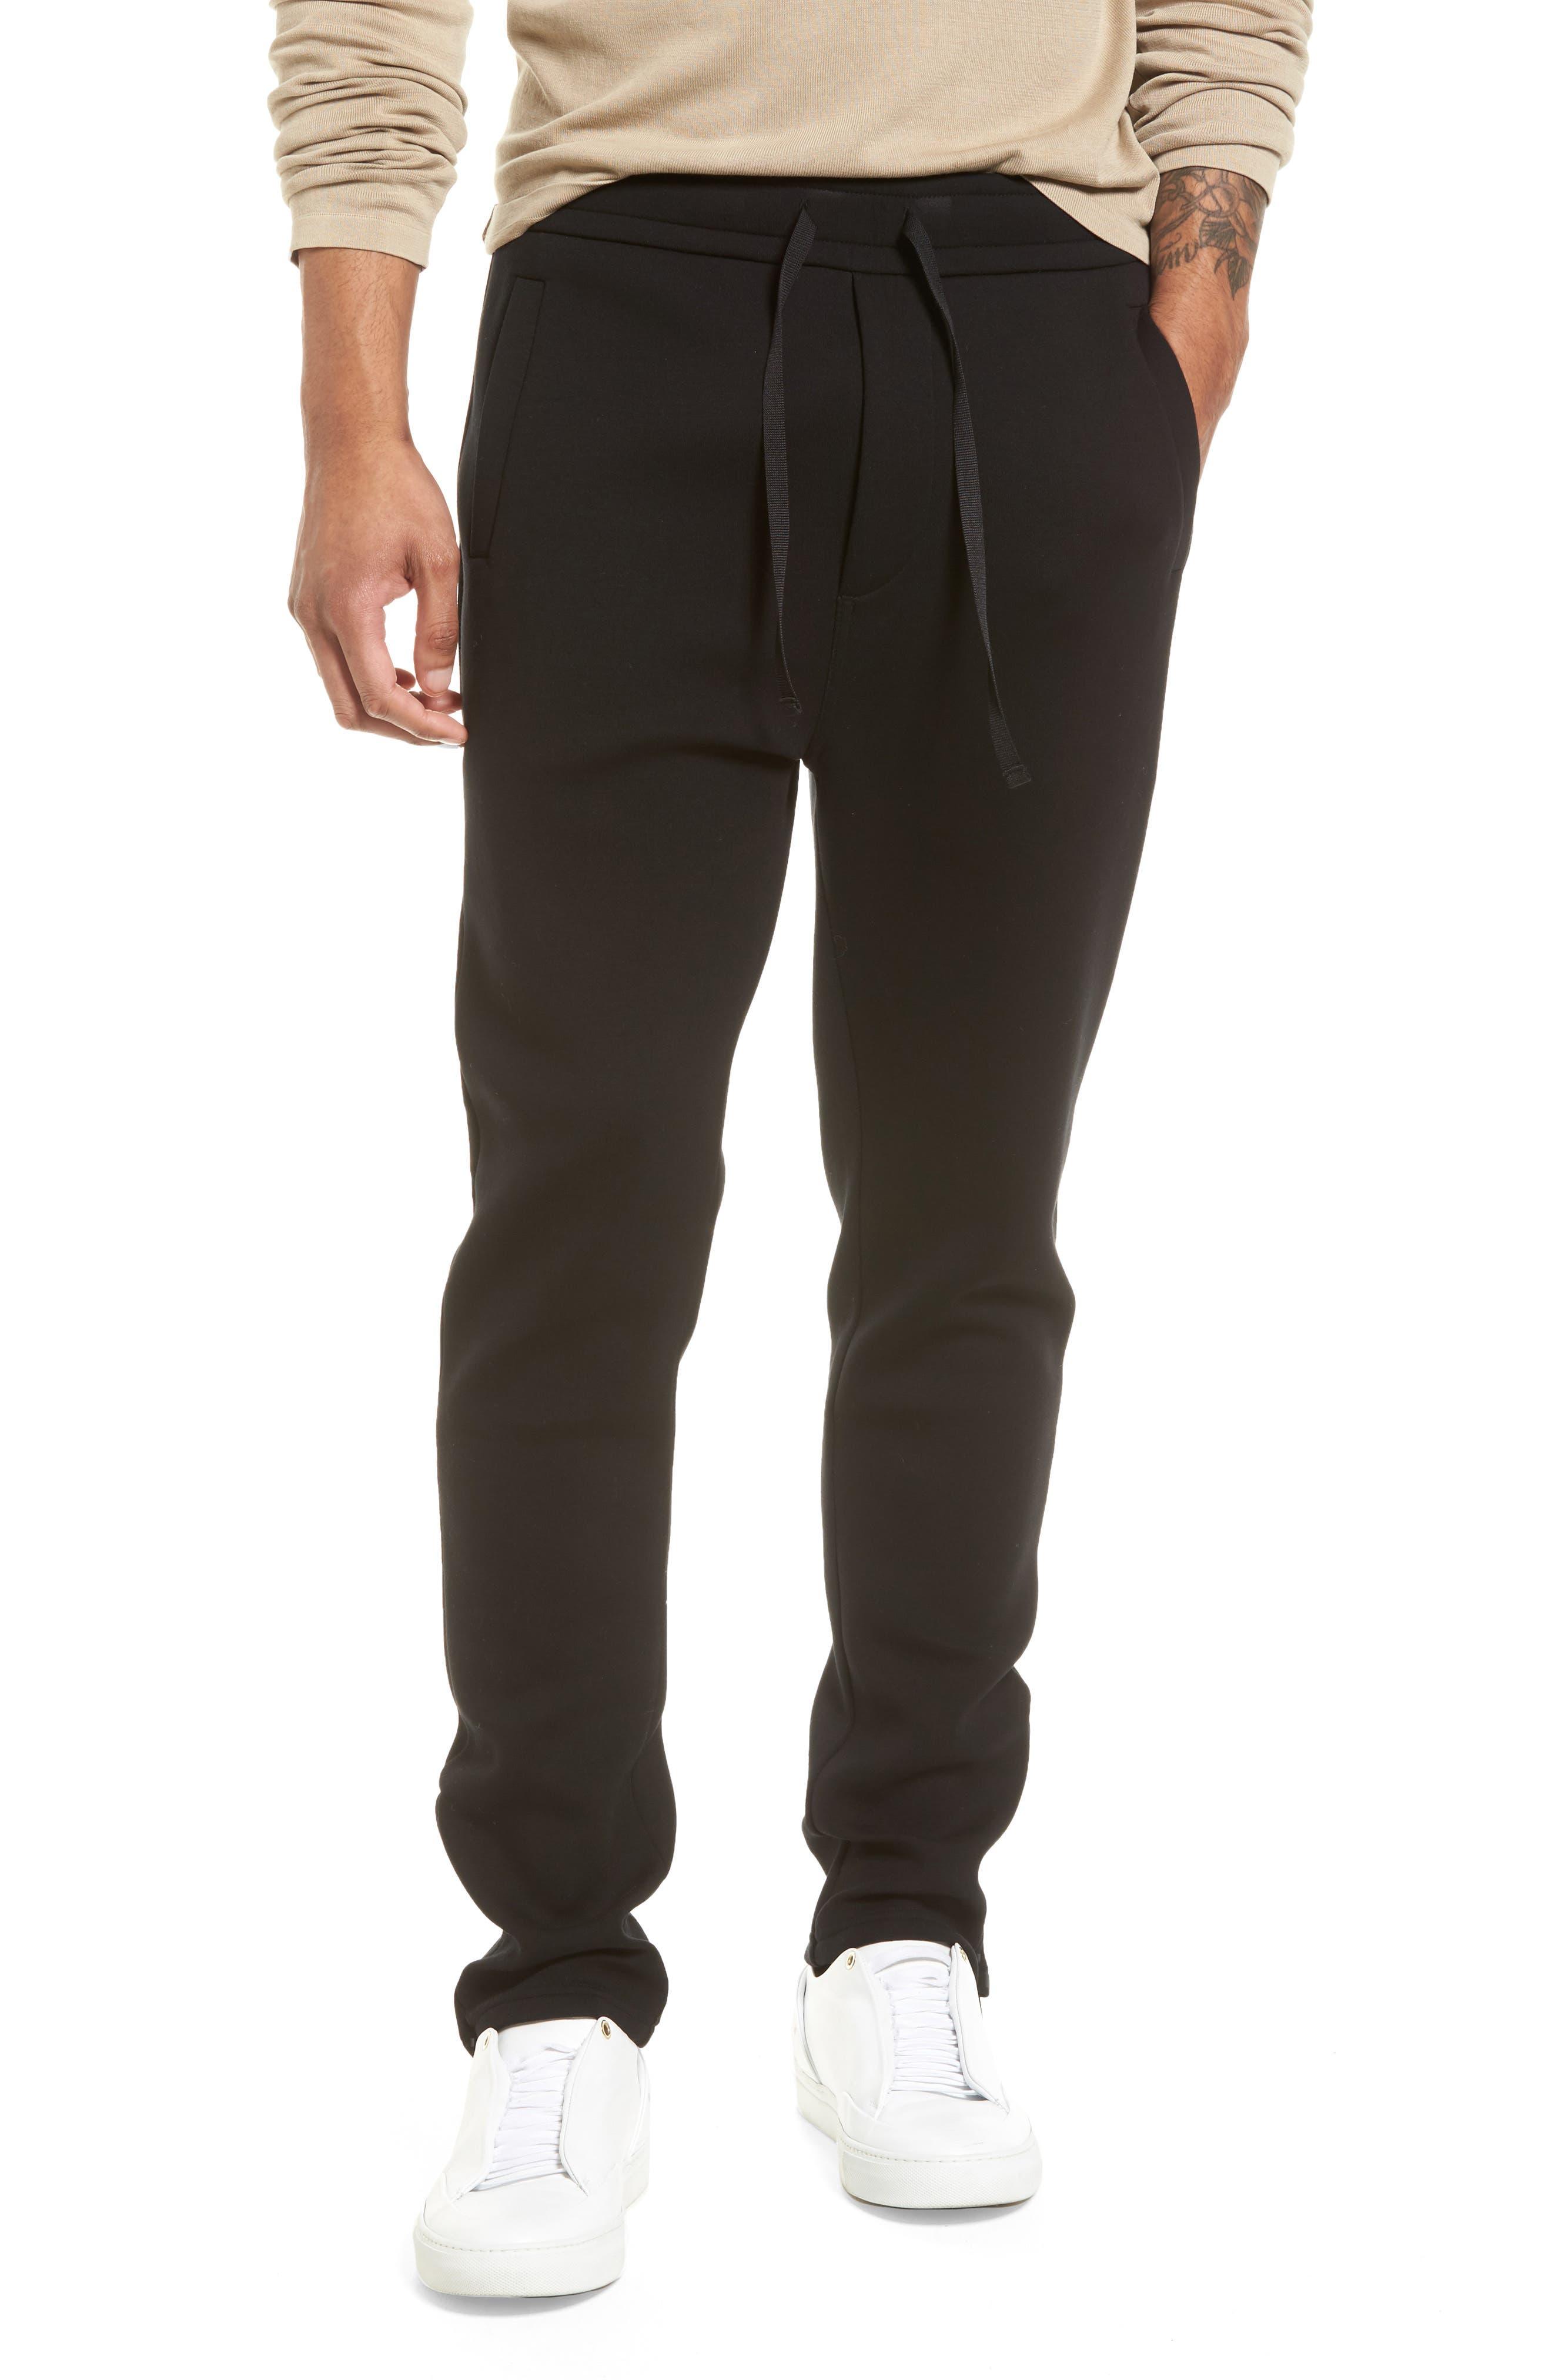 Alternate Image 1 Selected - Vince Tech Slim Fit Track Pants